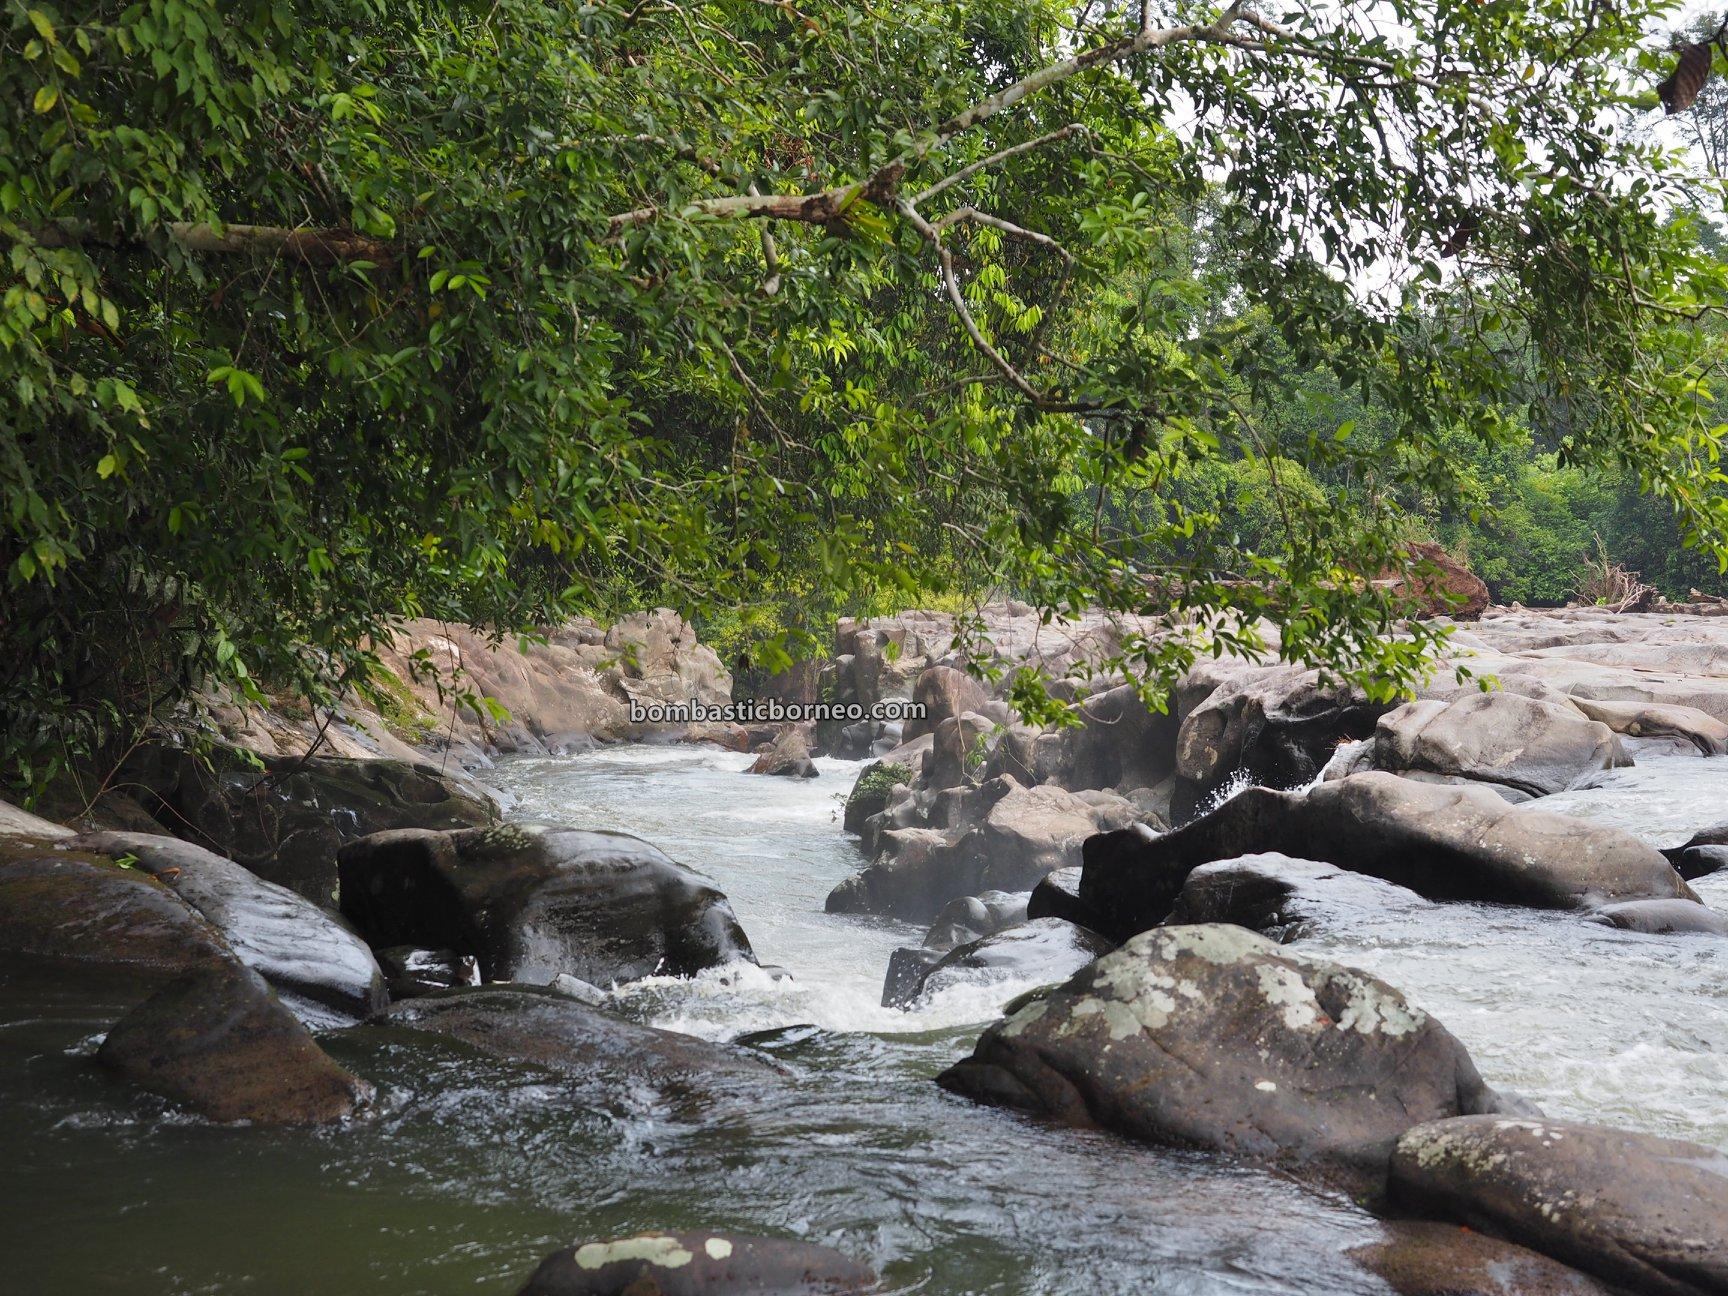 Riam Kodu, Waterfall, Dusun Simpang Empat, adventure, nature, outdoor, exploration, Seluas, Obyek Wisata, Travel guide, village, Trans Border, Borneo, 探索婆罗洲瀑布, 印尼西加里曼丹